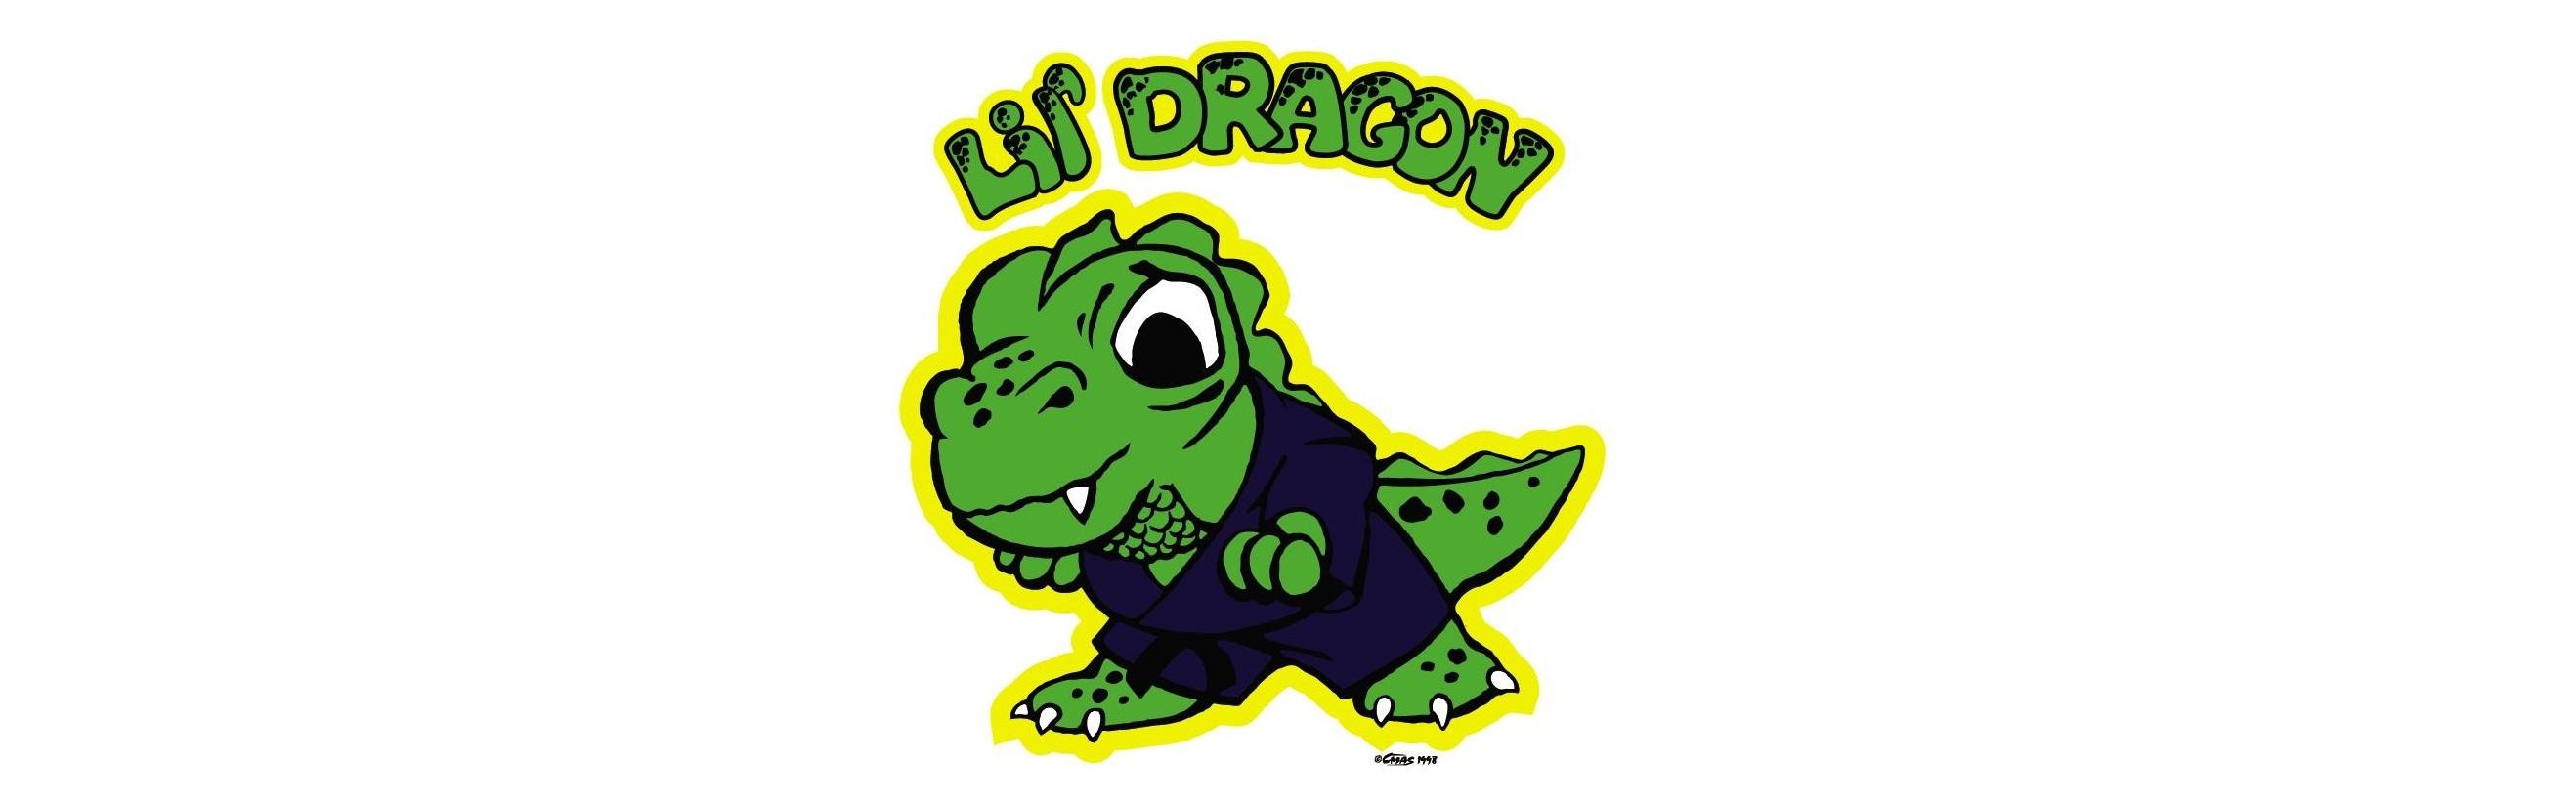 Lil Dragon logo